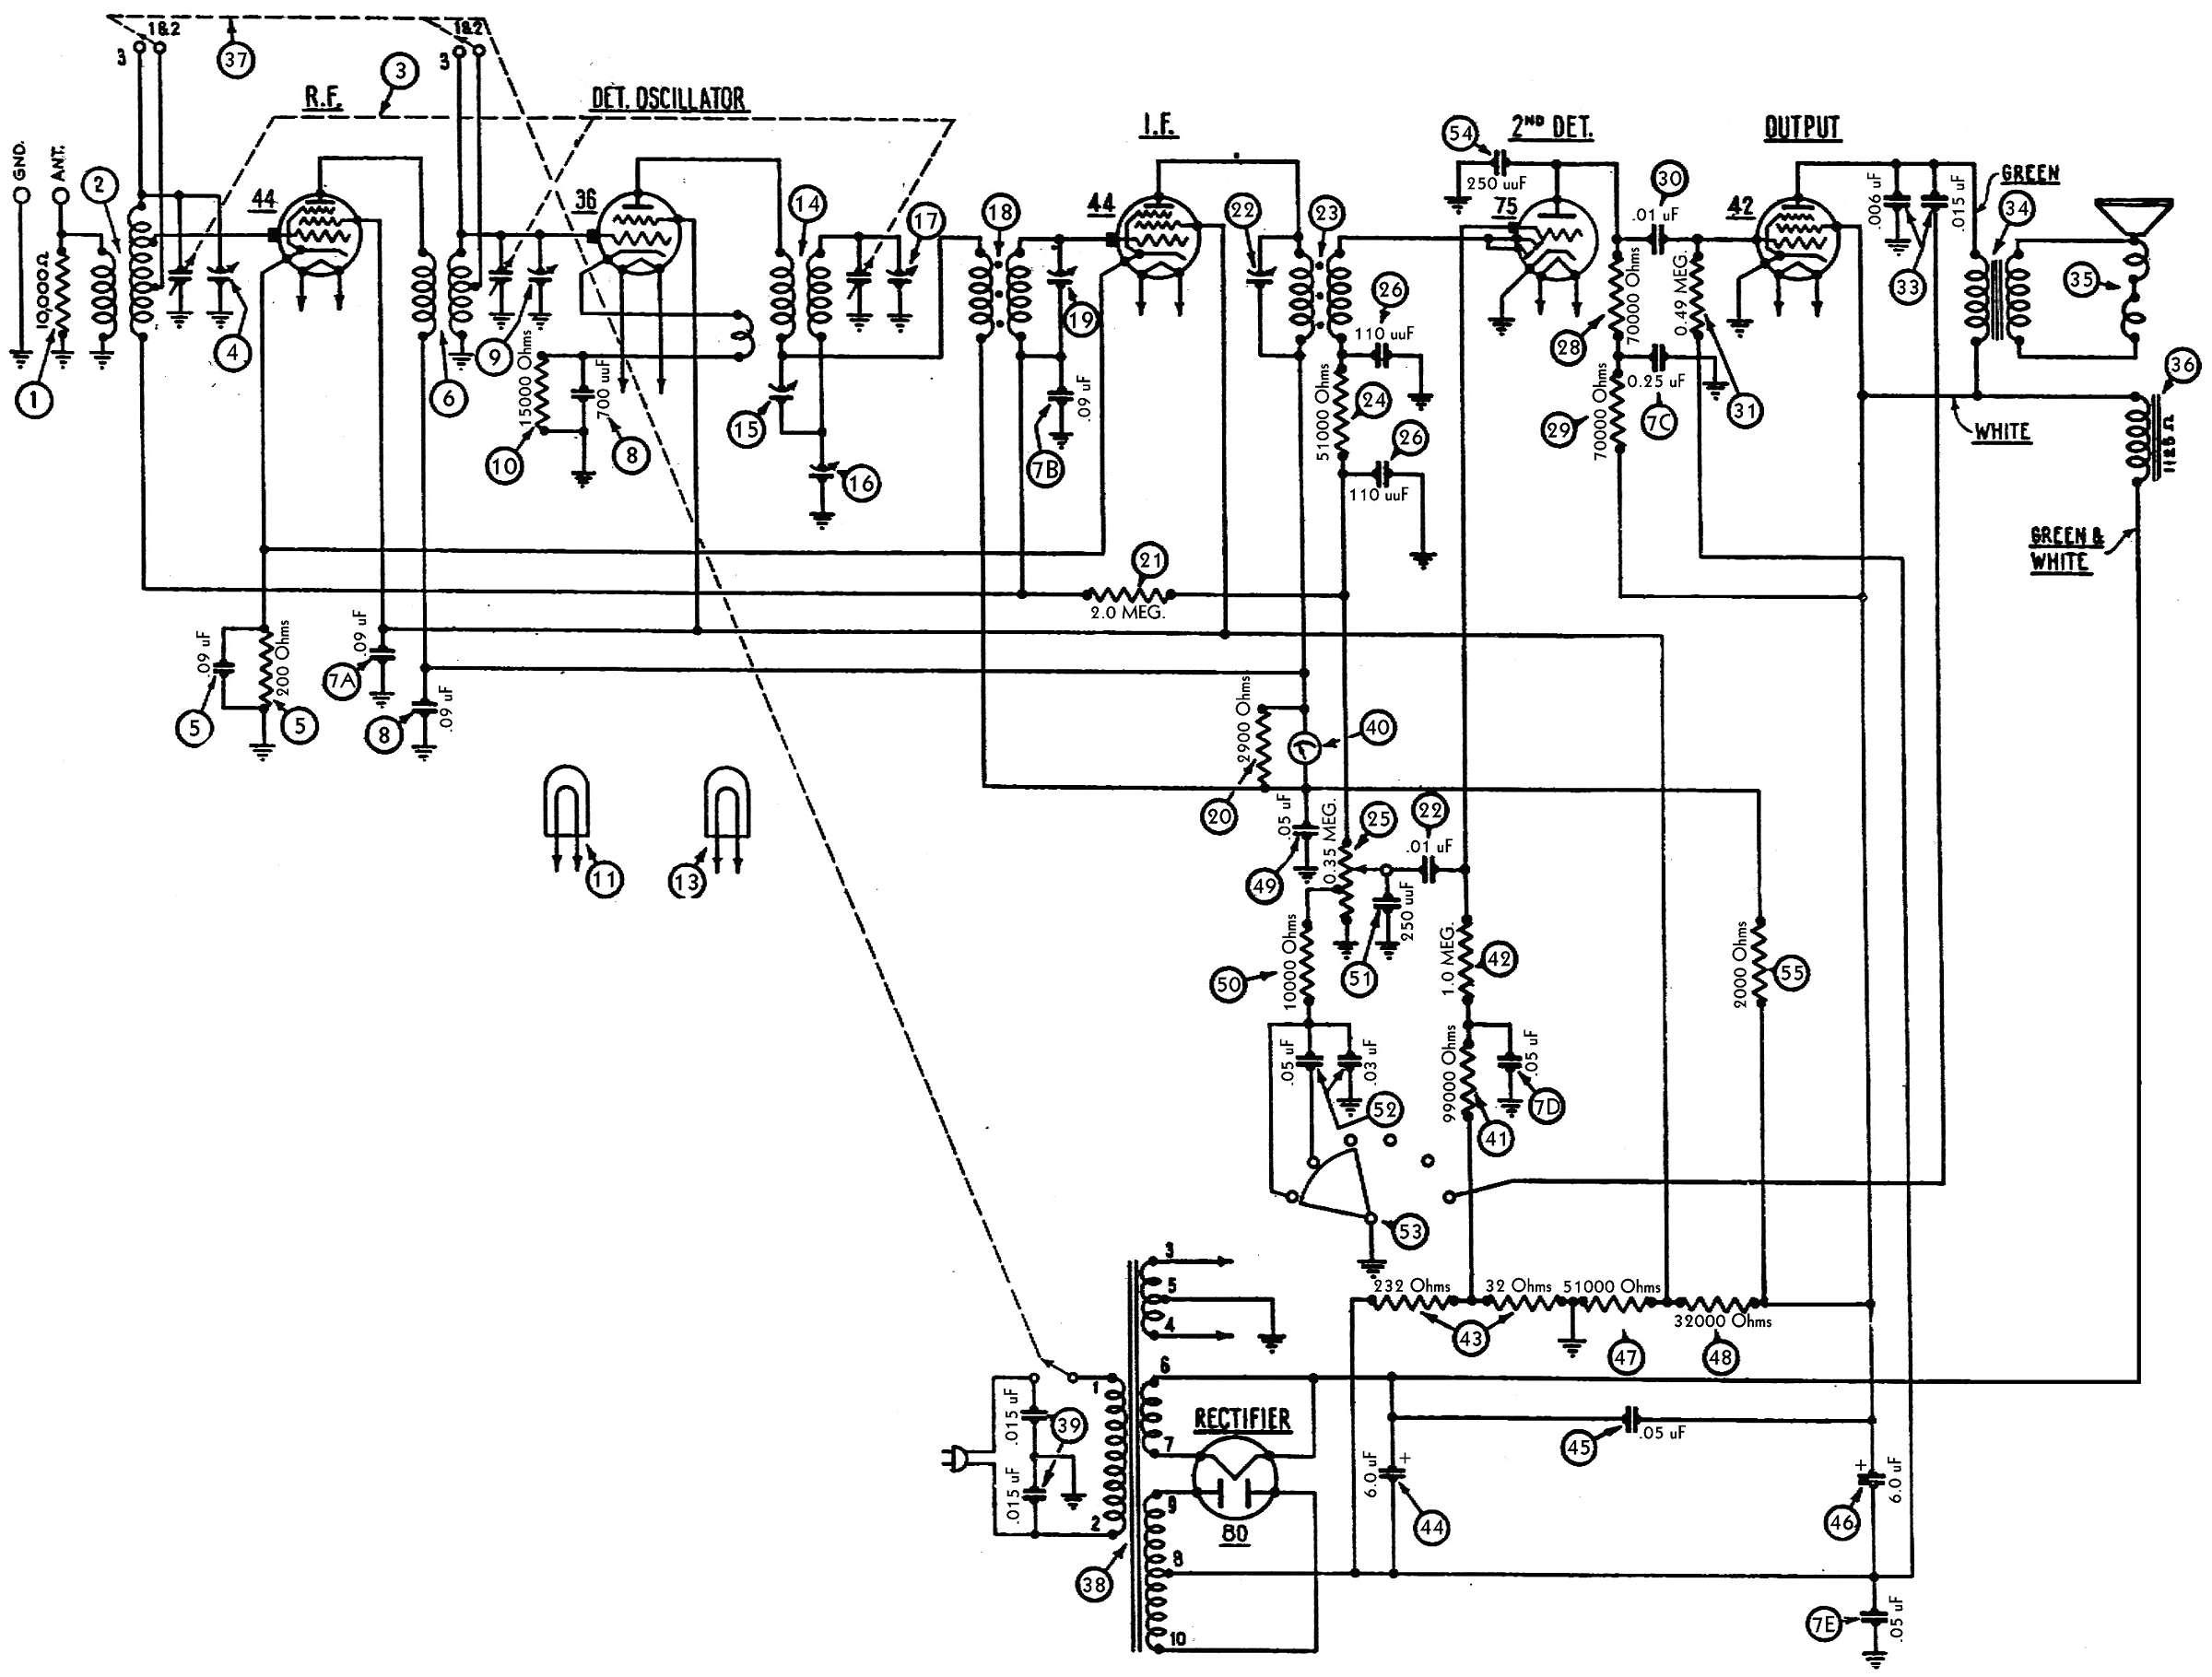 Bakelite Philco Block Resistor Wattage